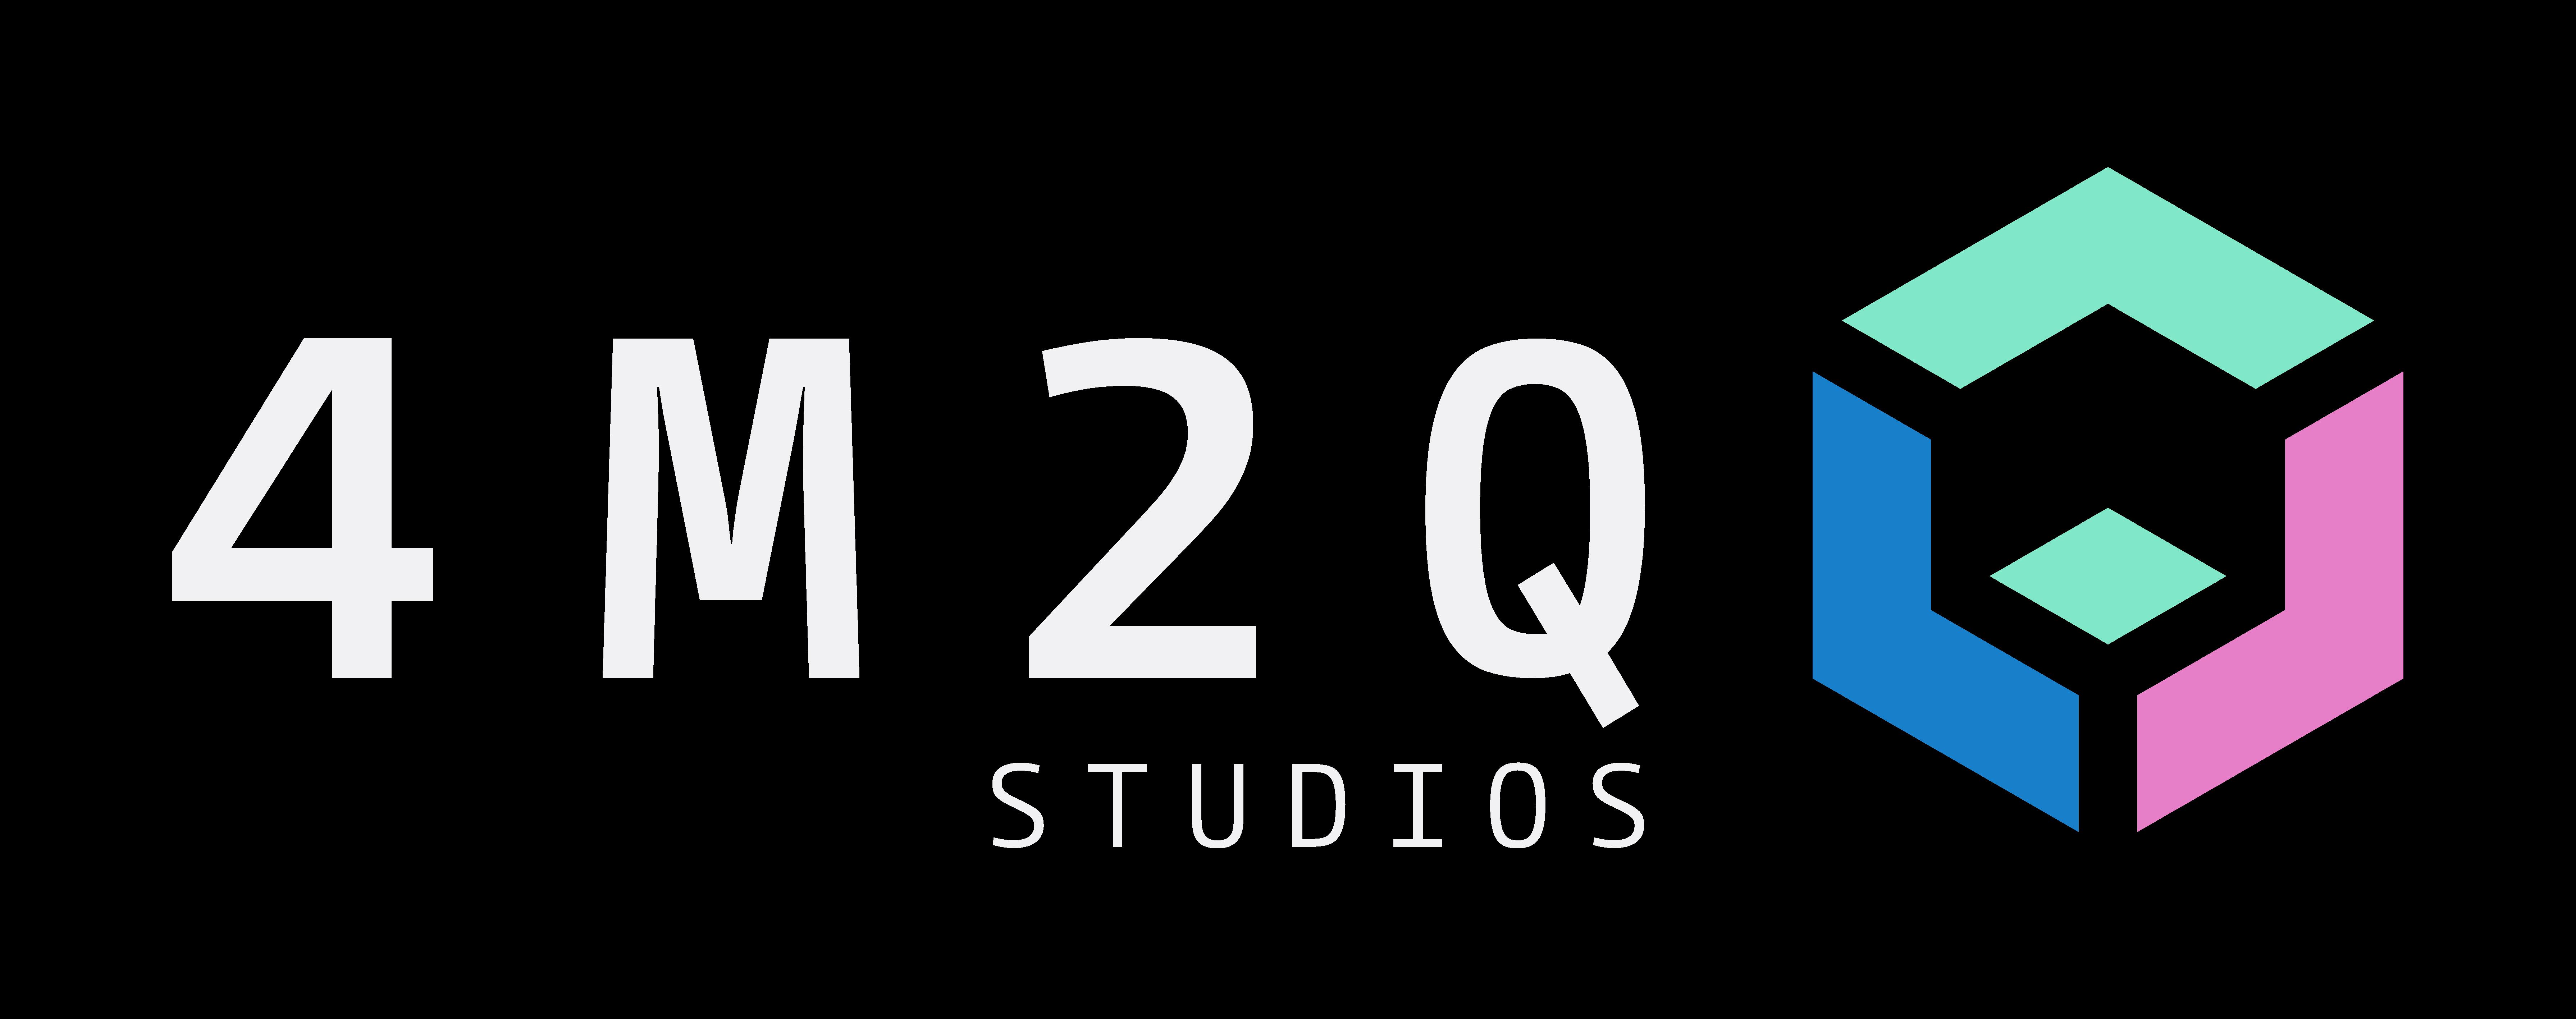 4M2Q Blog